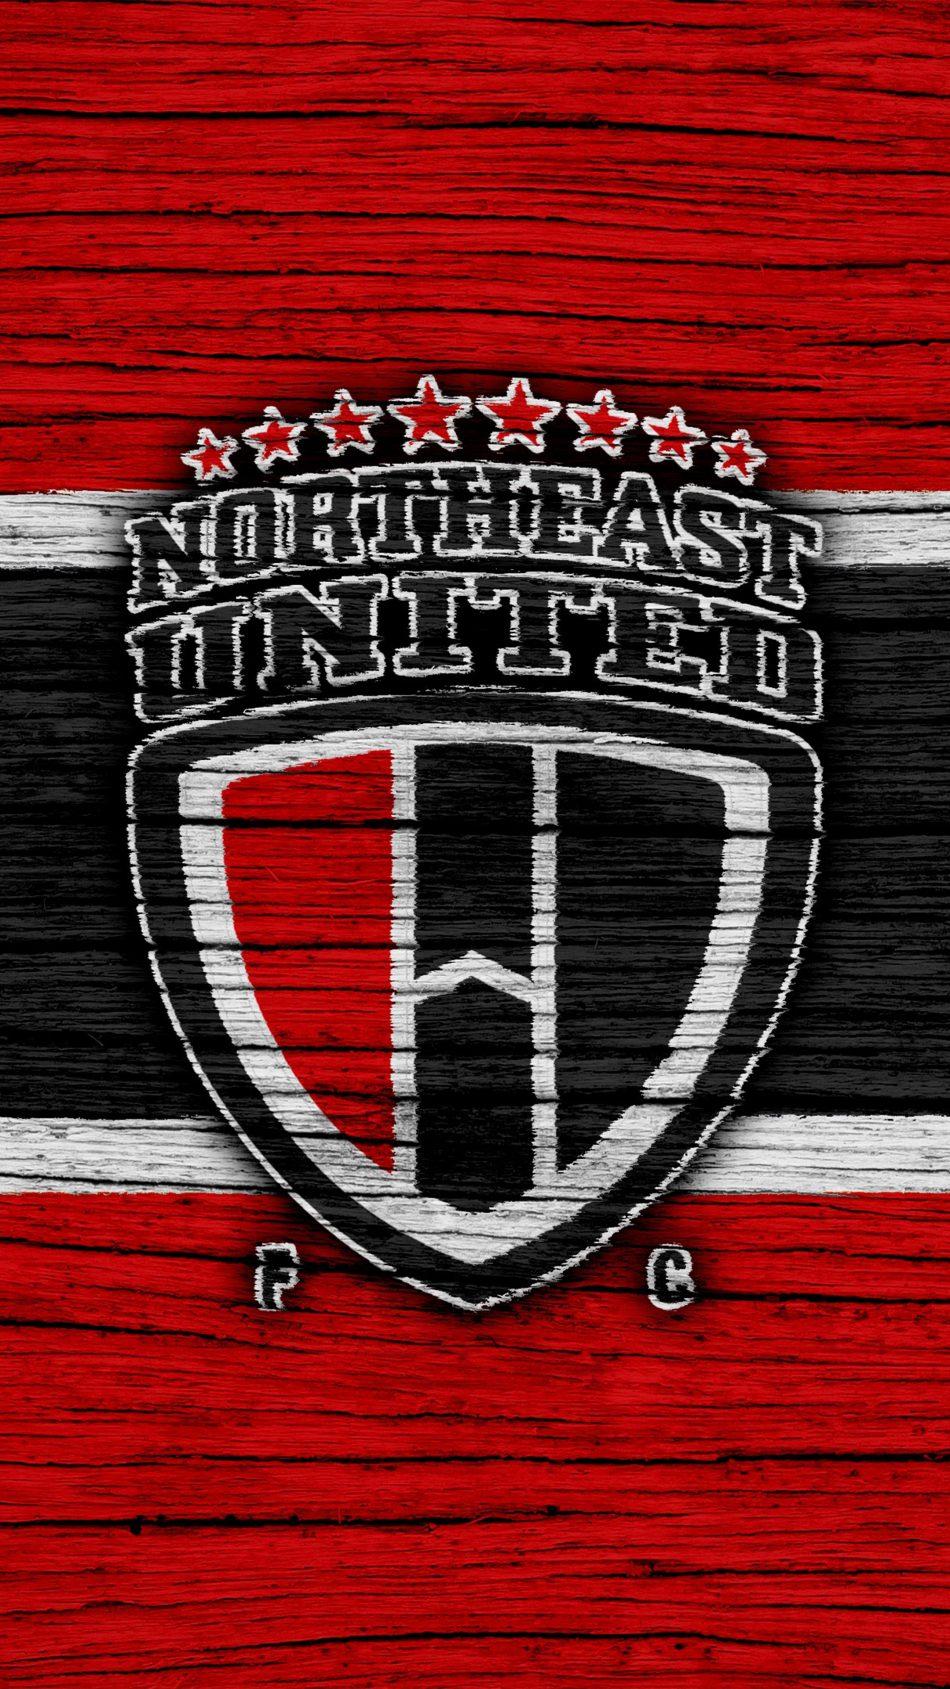 NorthEast United FC 2018 4K Ultra HD Mobile Wallpaper